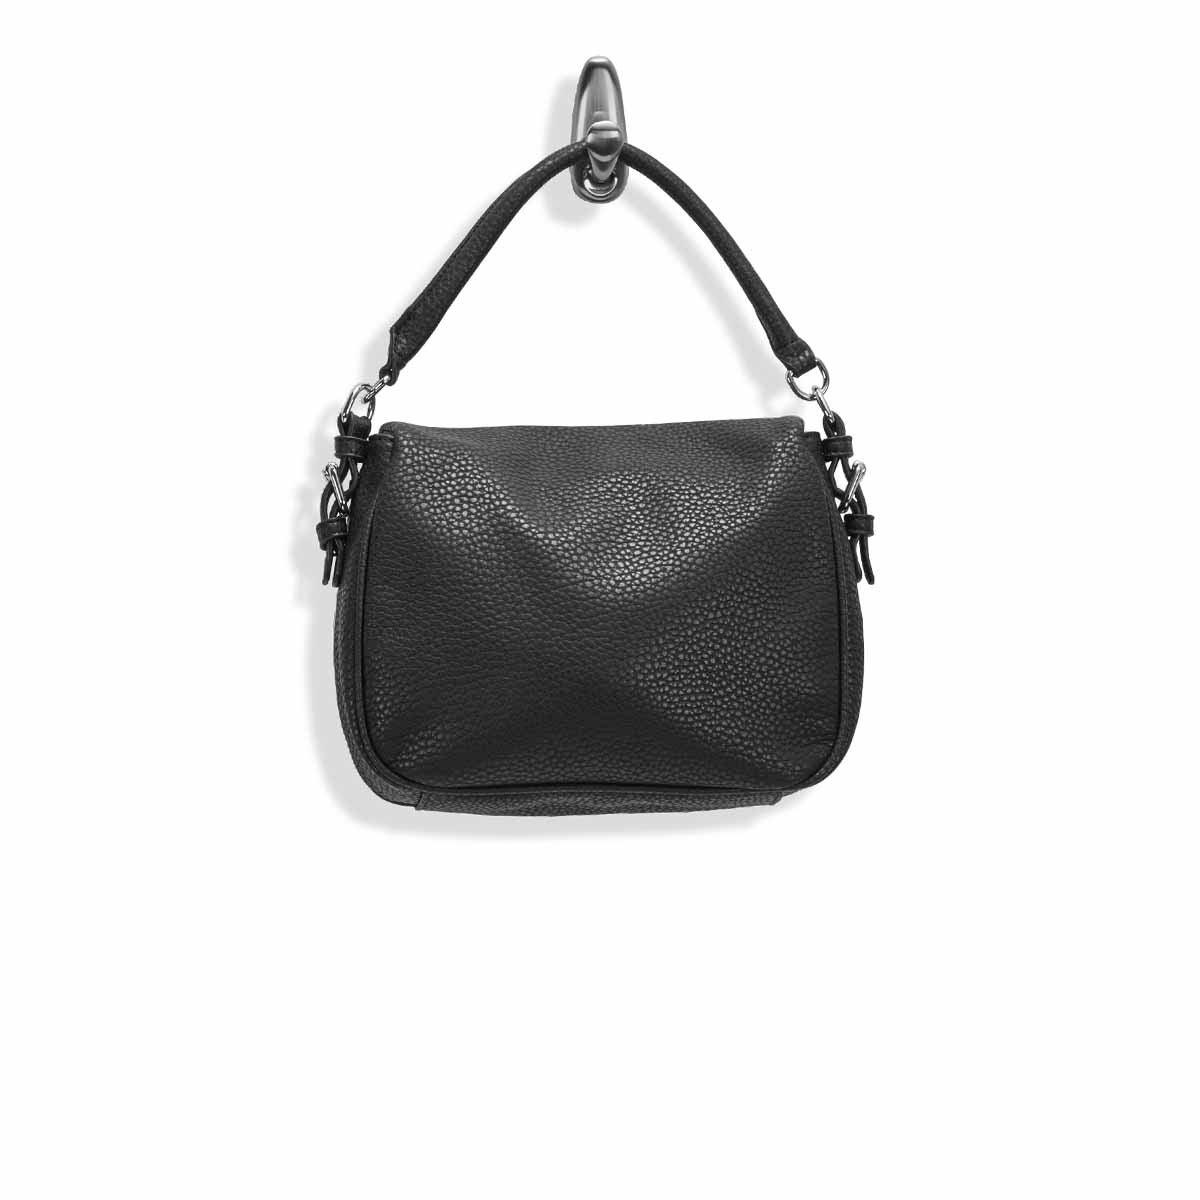 Lds Sasha black hobo crossbody bag